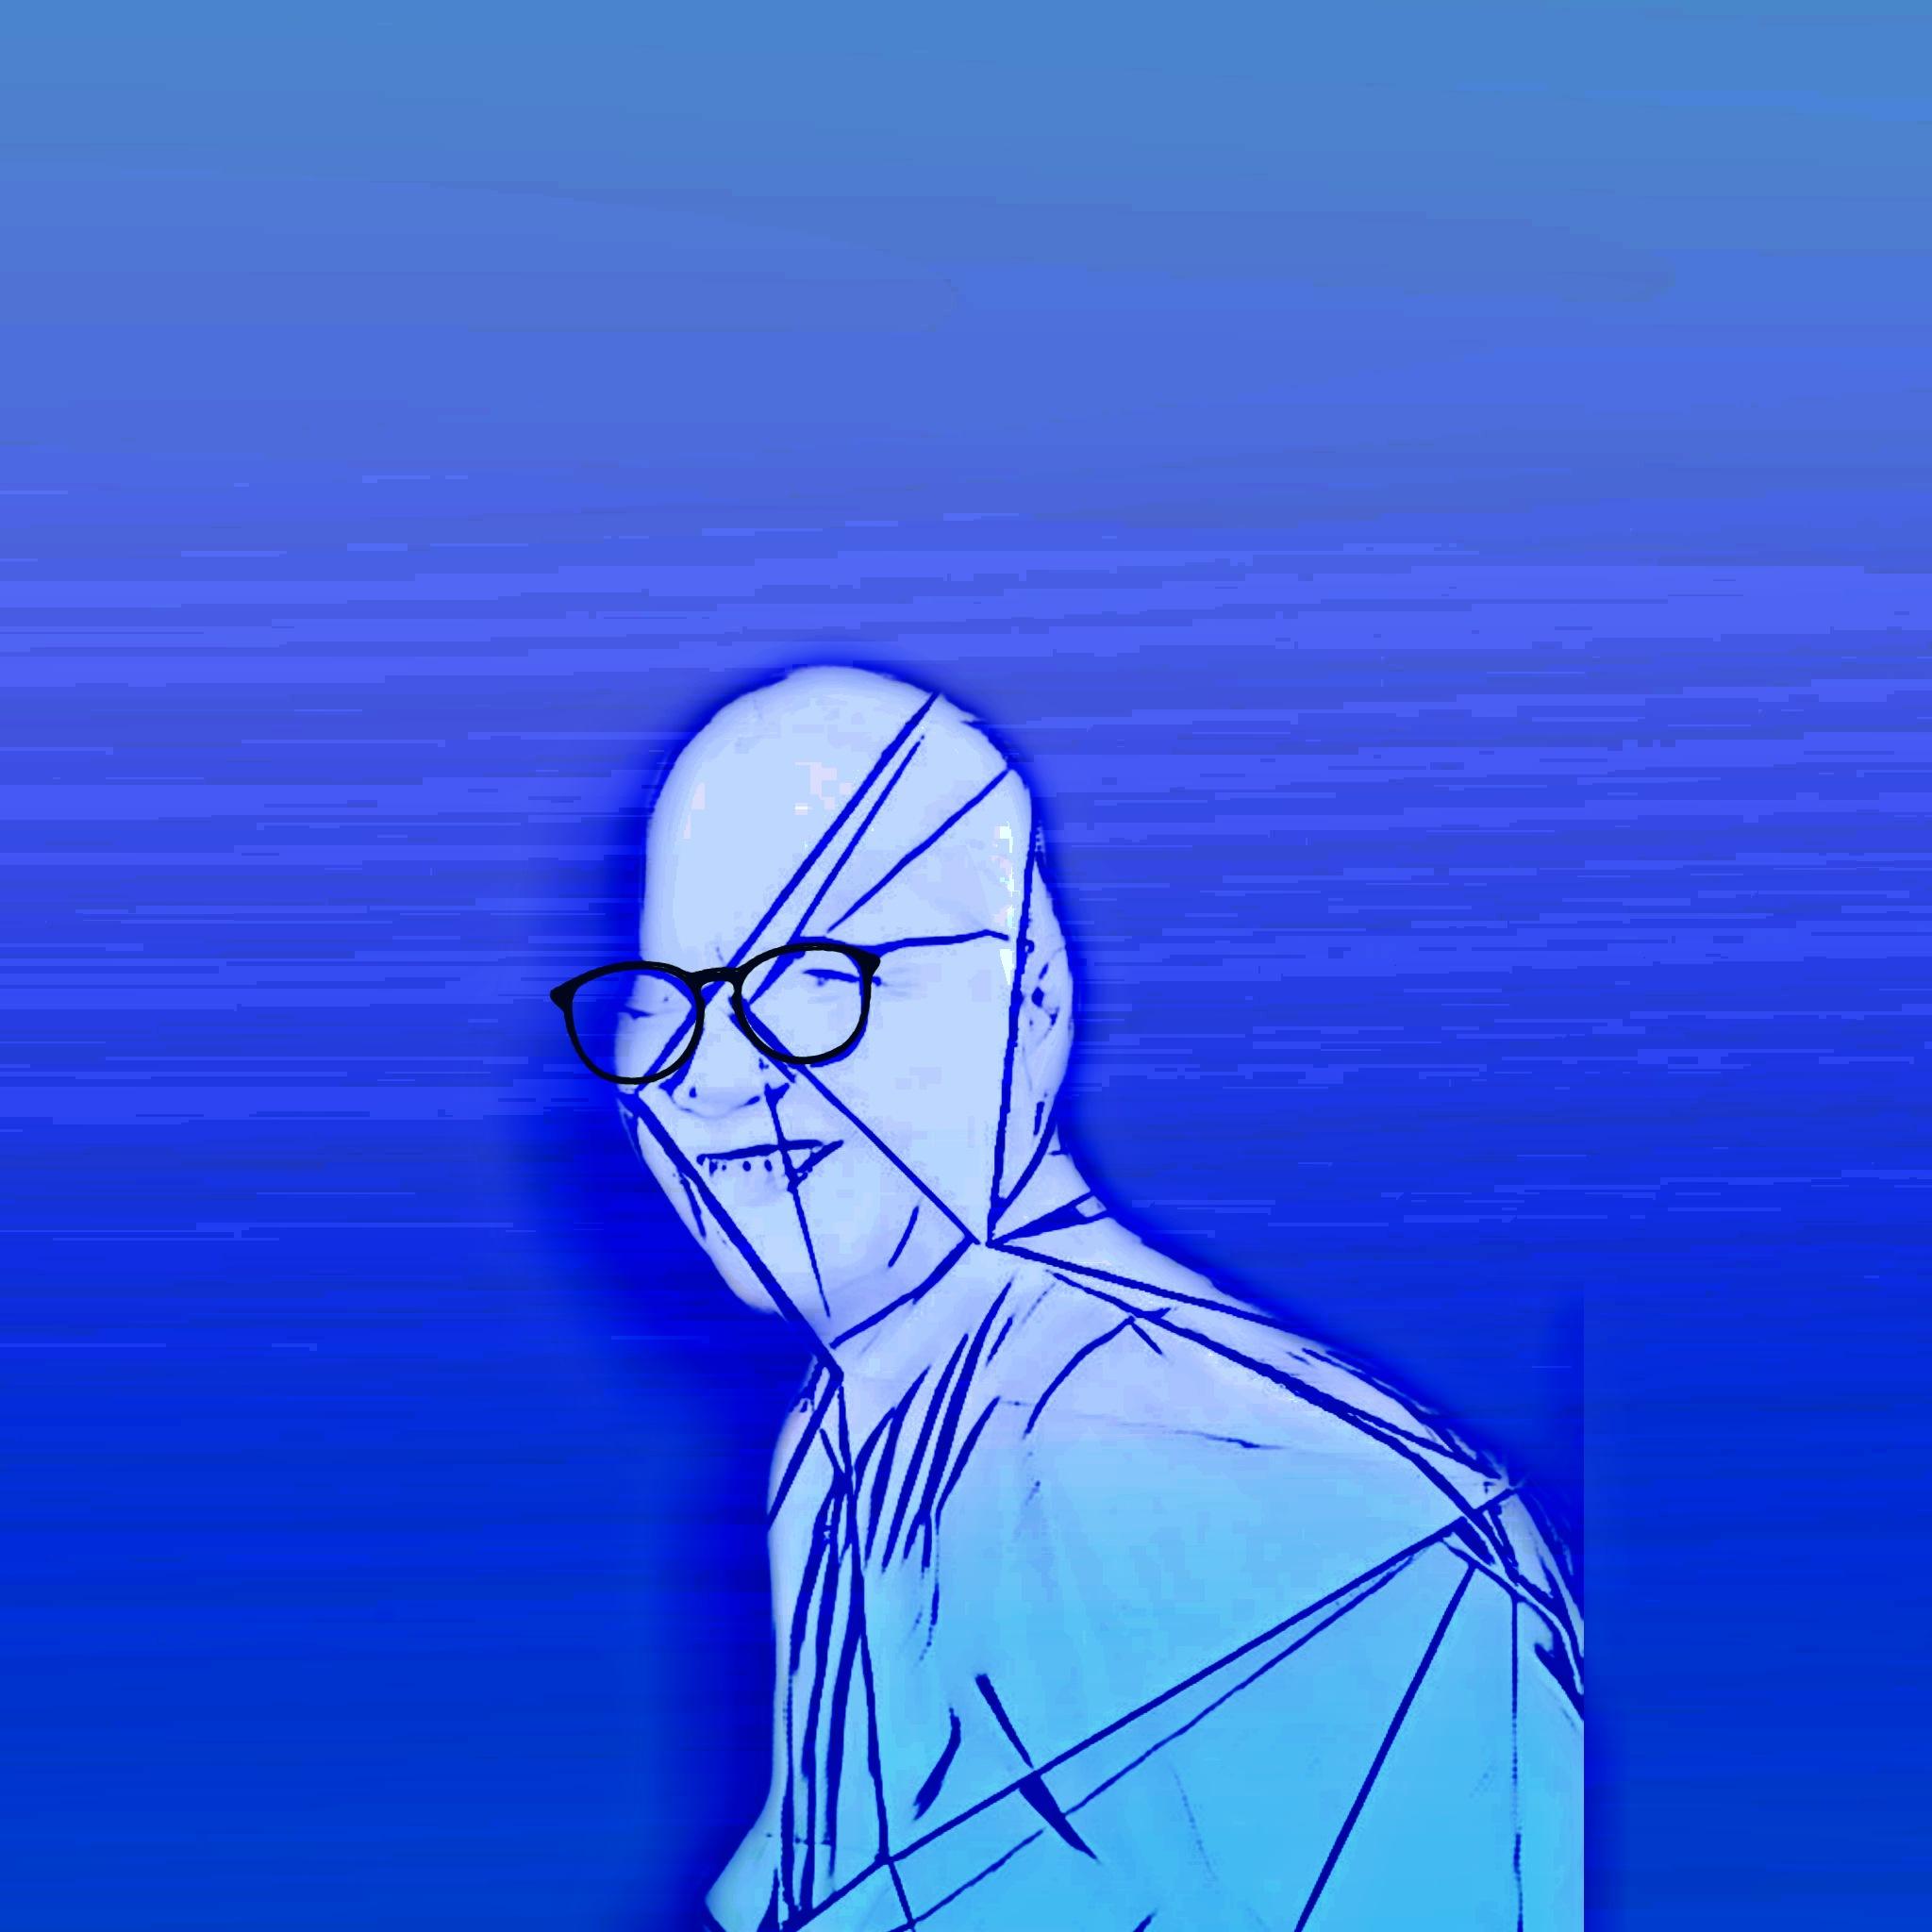 Animated face illustration